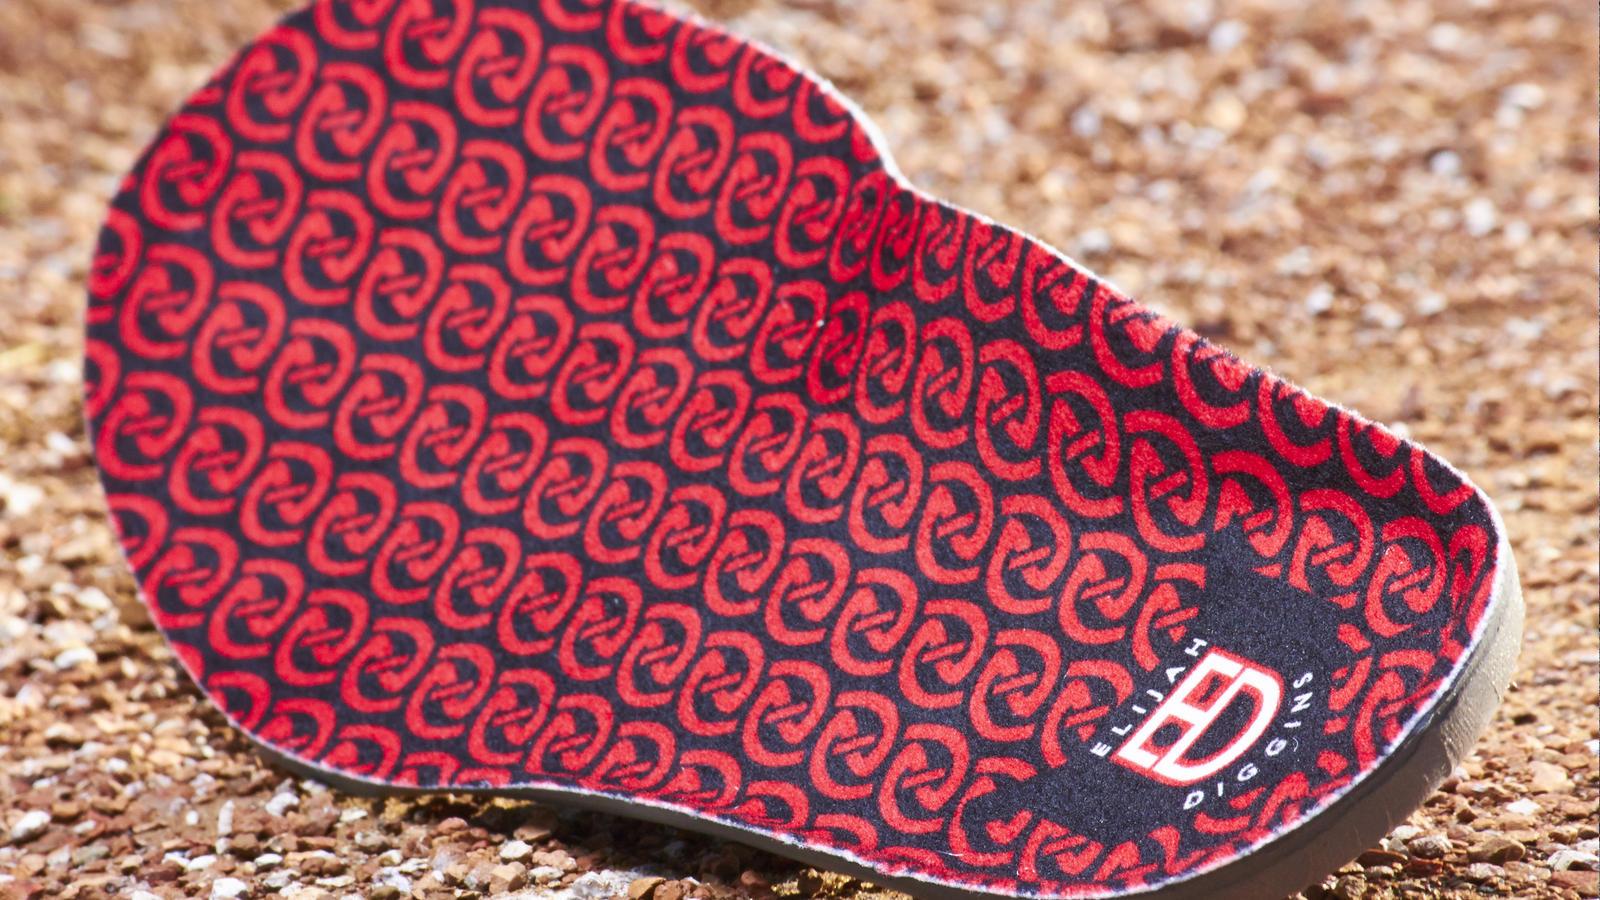 Footwear Detail V7 0071